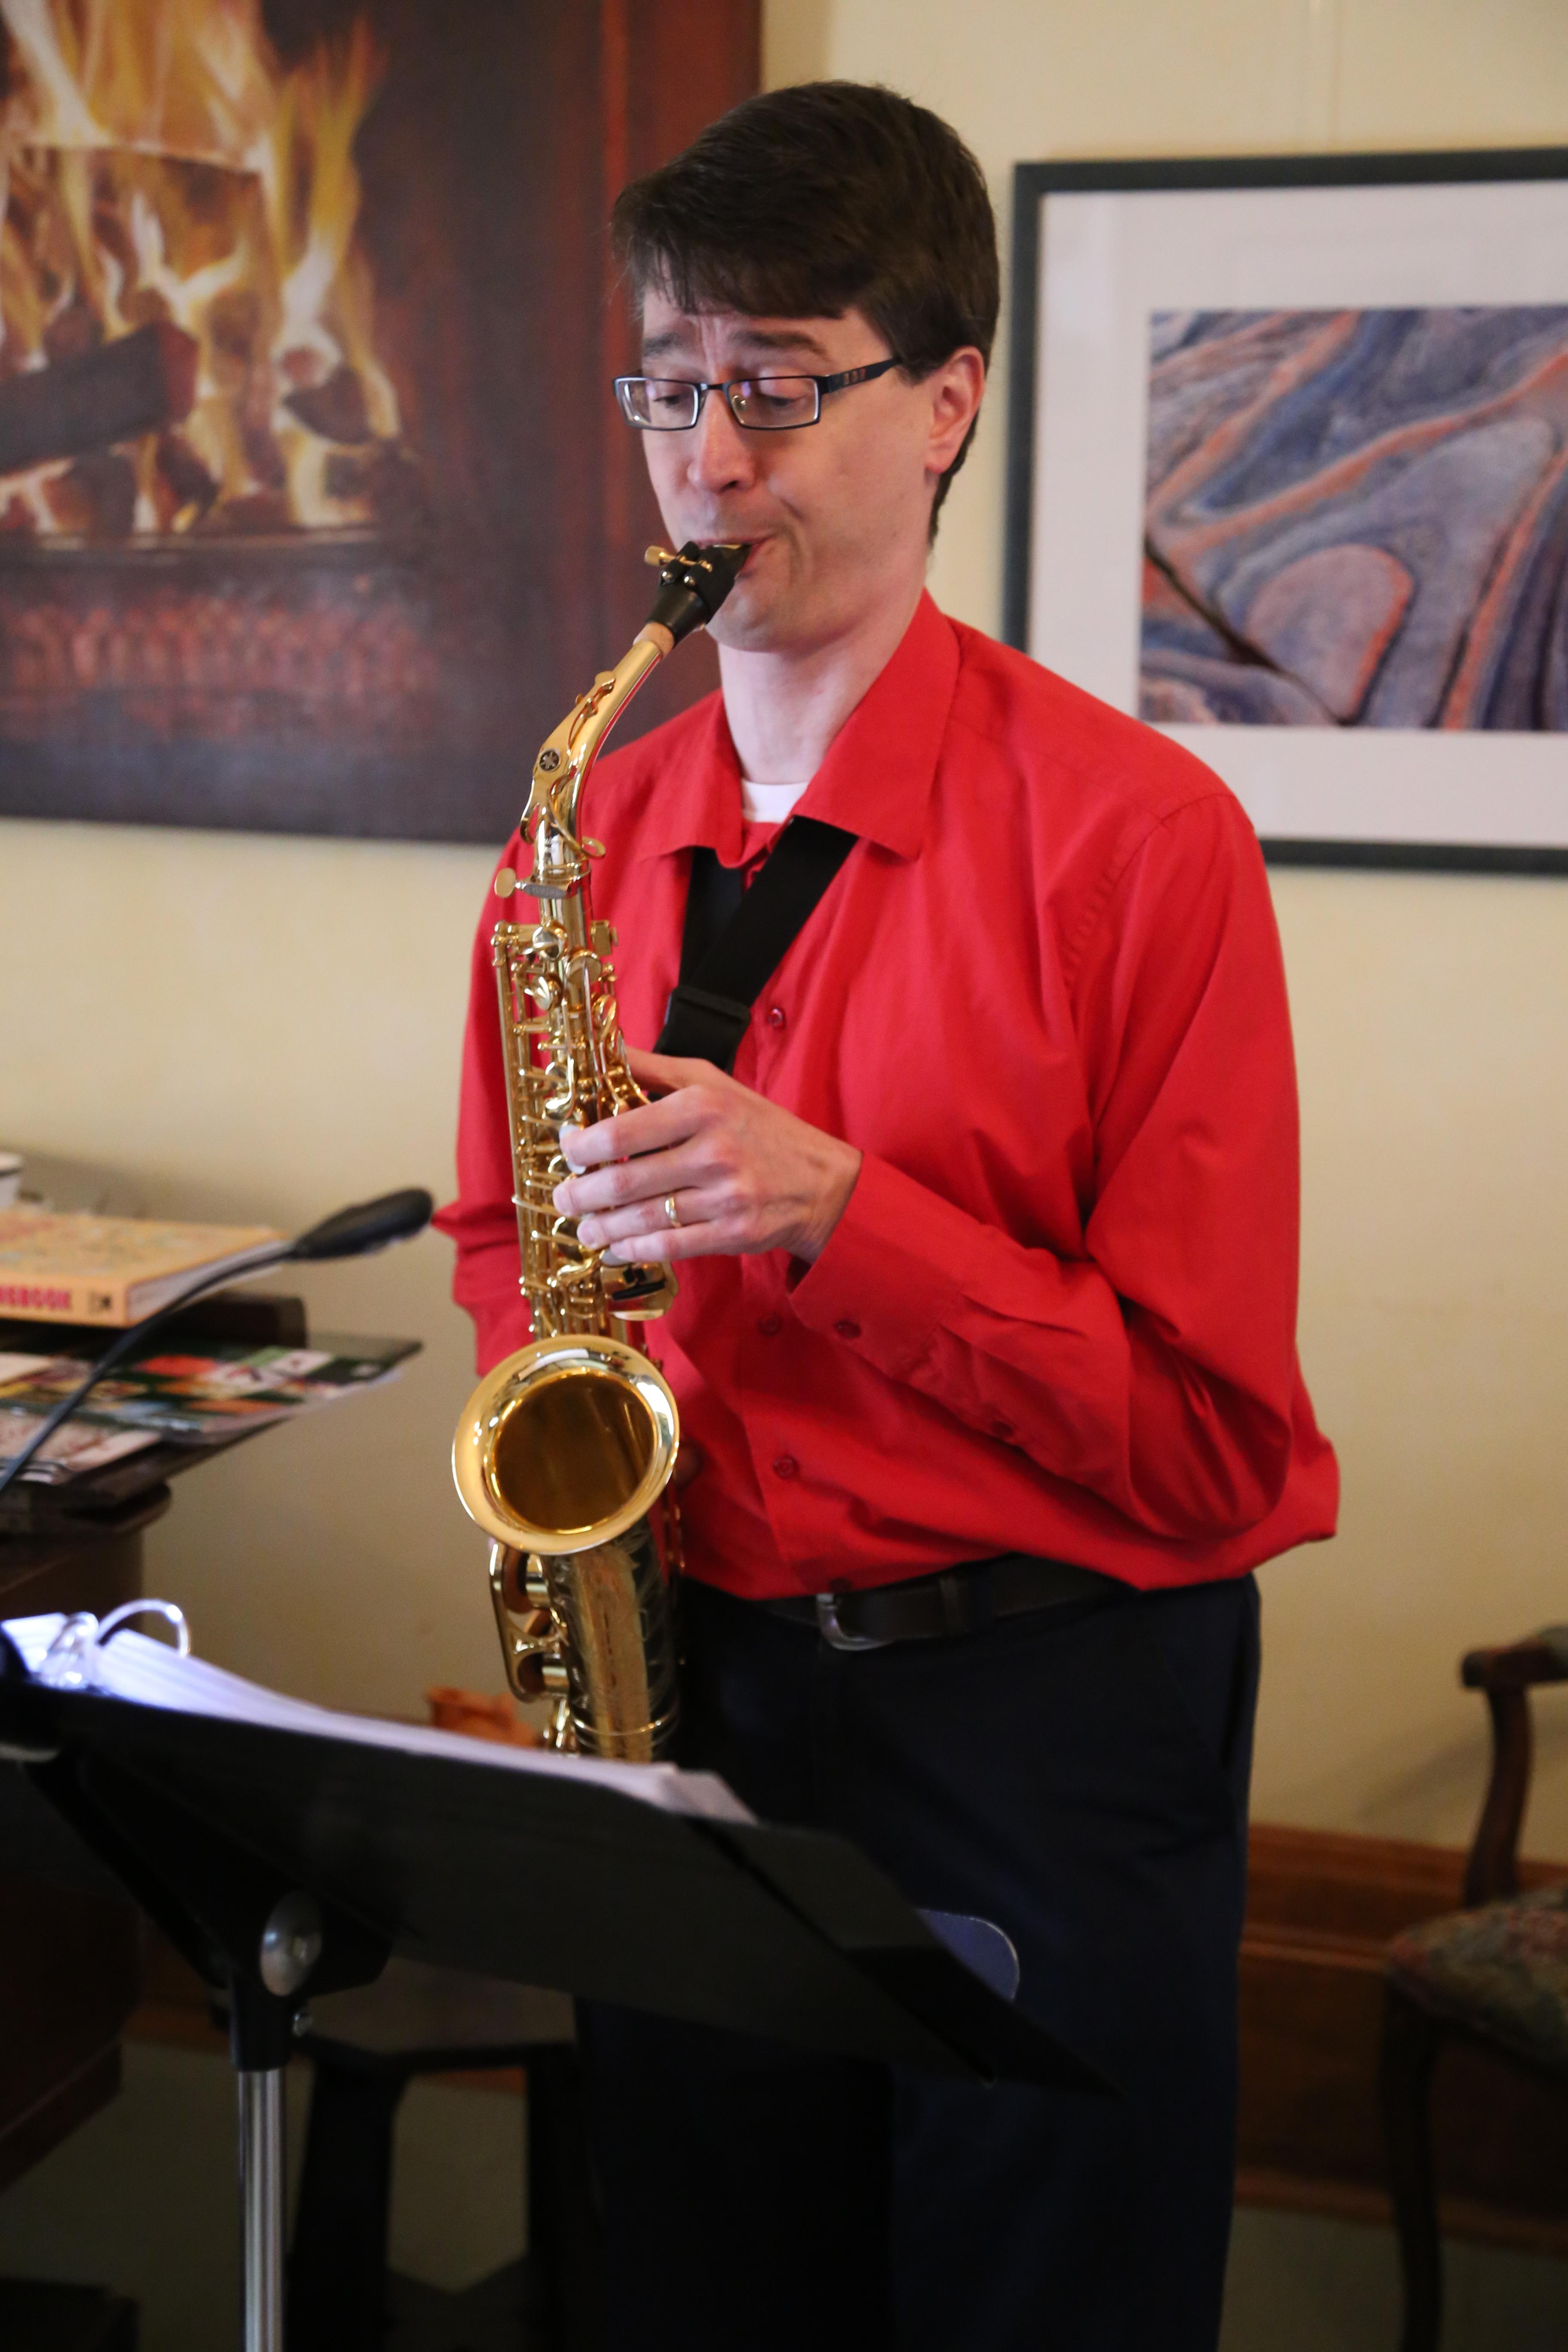 Tim saxophone Hillary house 2015 Melanie Bell Snapd Aurora